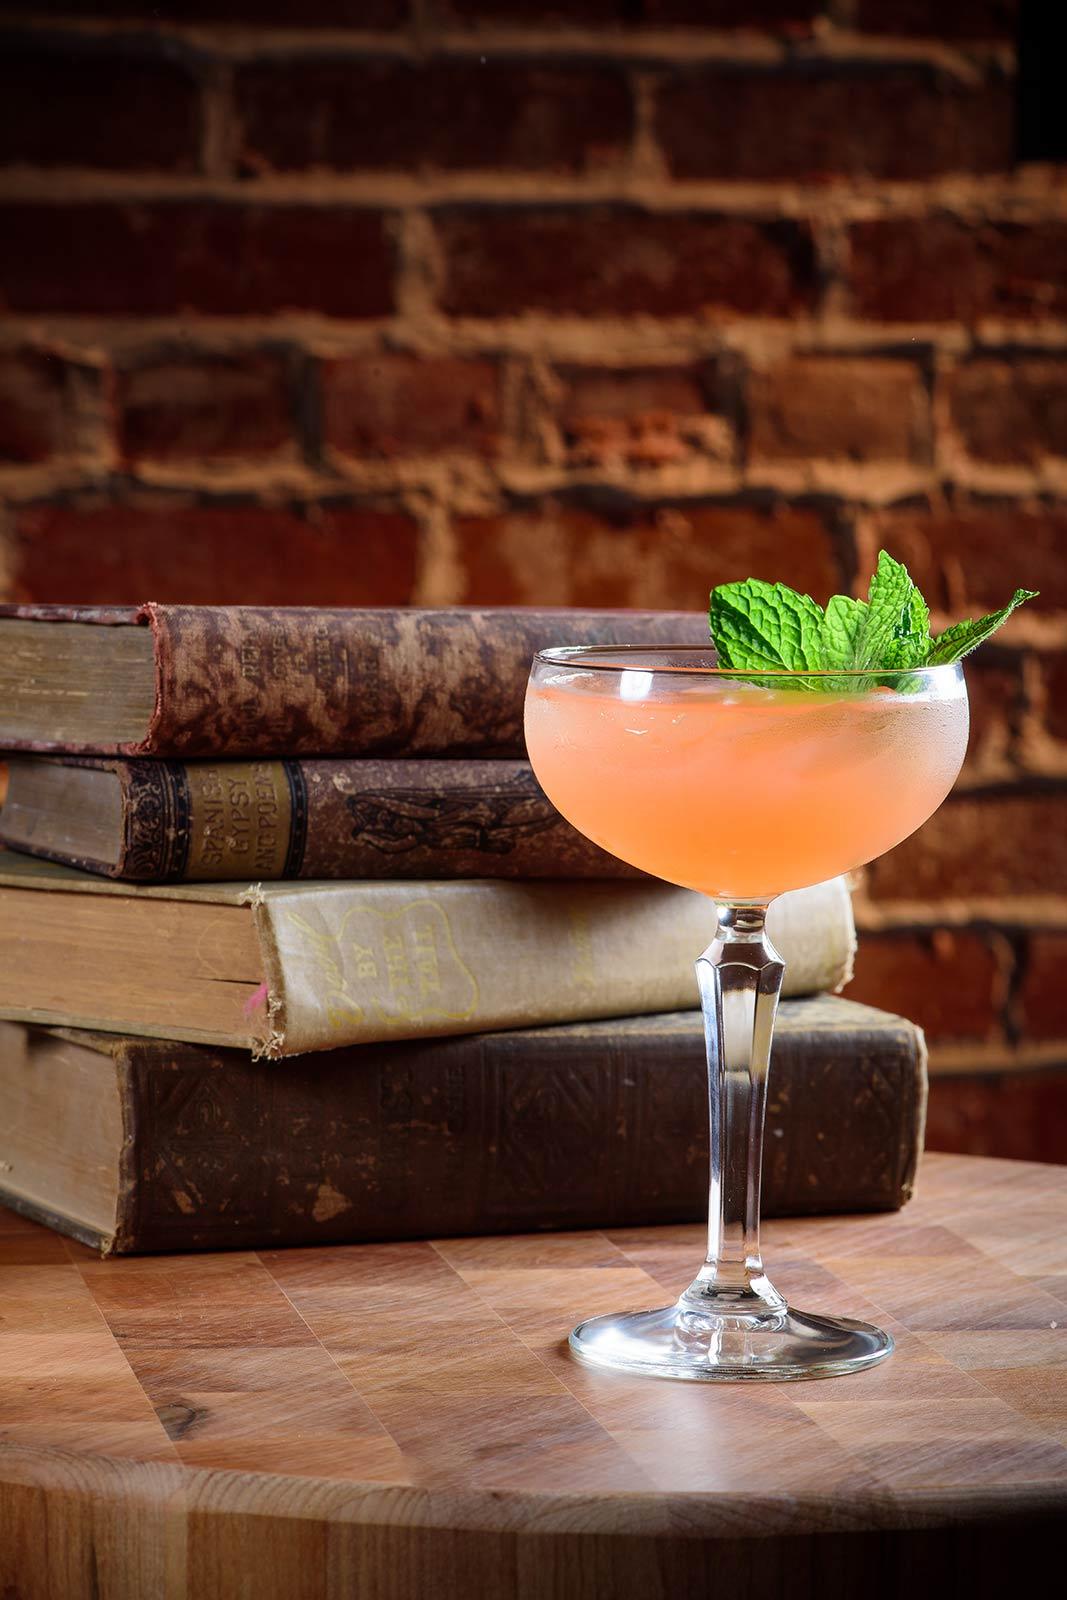 st-augustine-pub-english-pub-restaurant-chatsworth-craft-cocktails